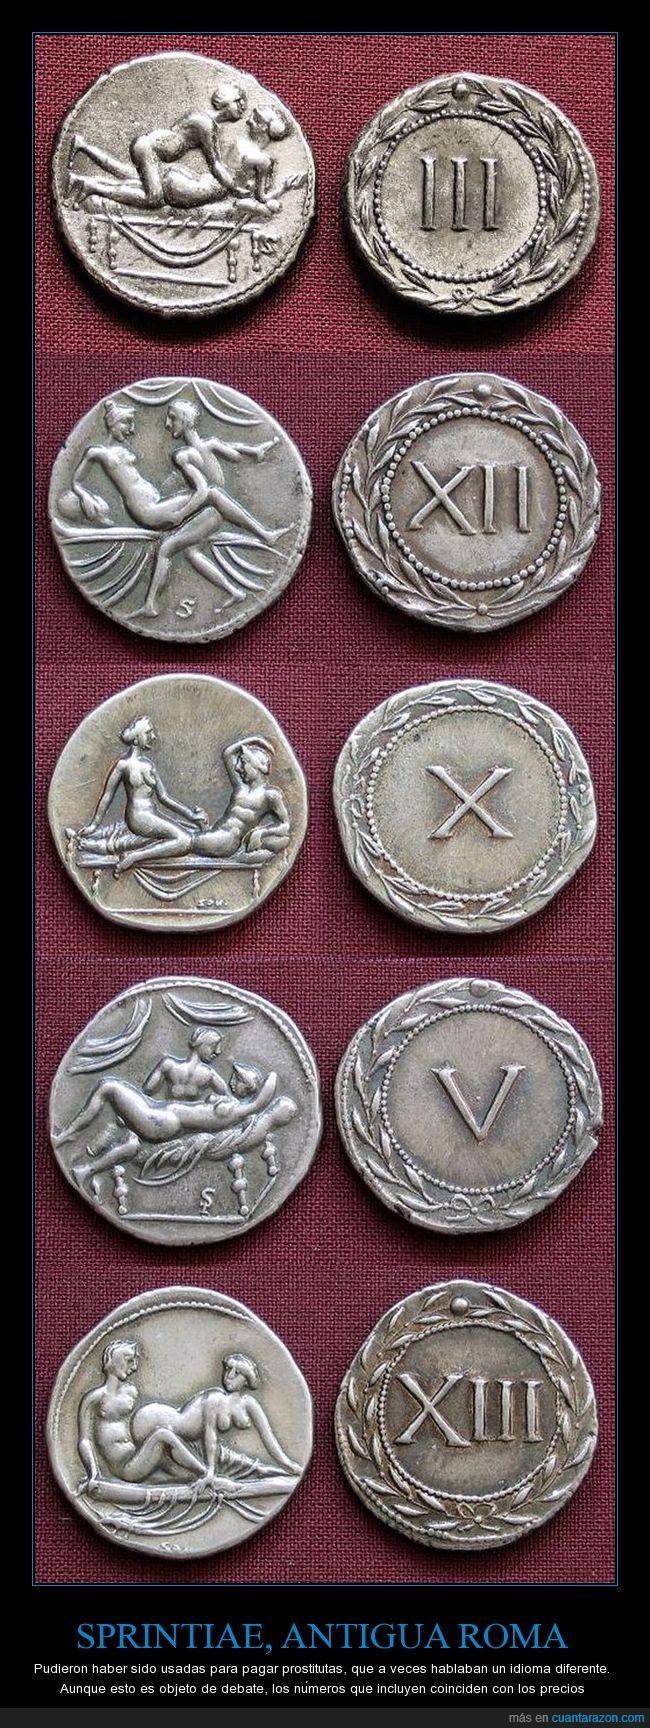 antigua roma,cambio,monedas,sprintiae